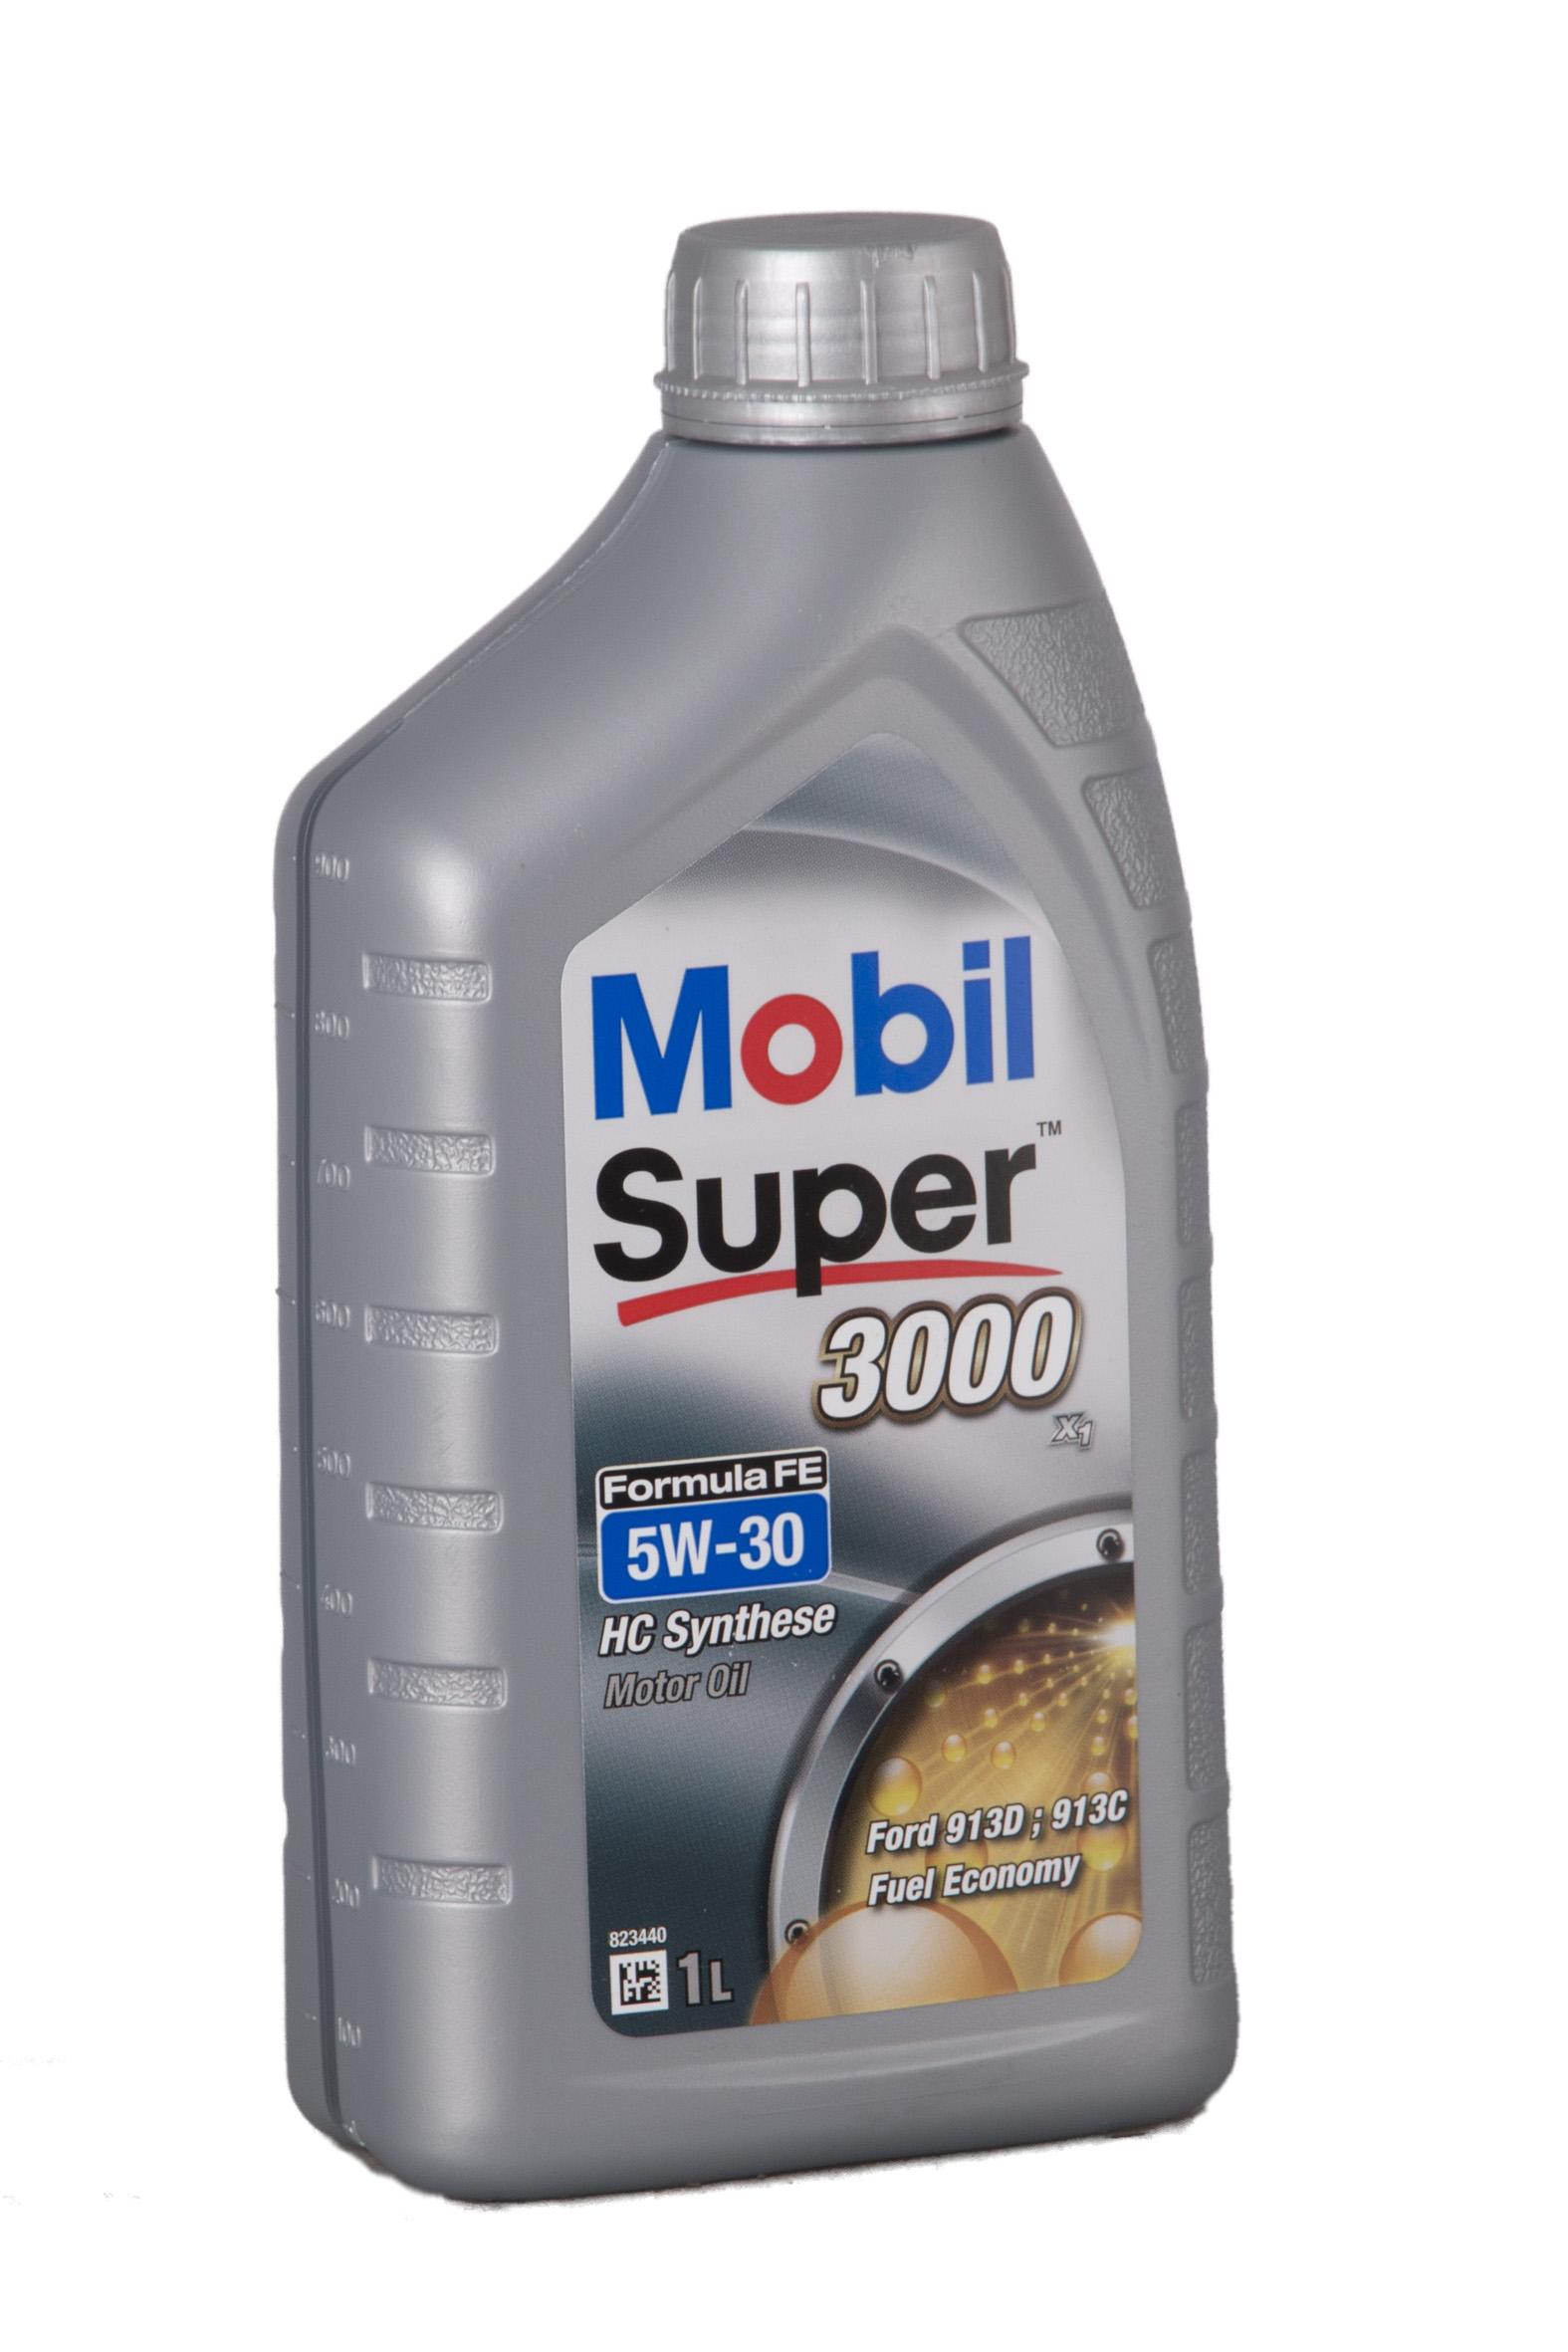 Mobil Super 3000 X1 Formula FE 5W-30 - 1 Liter – Bild 1